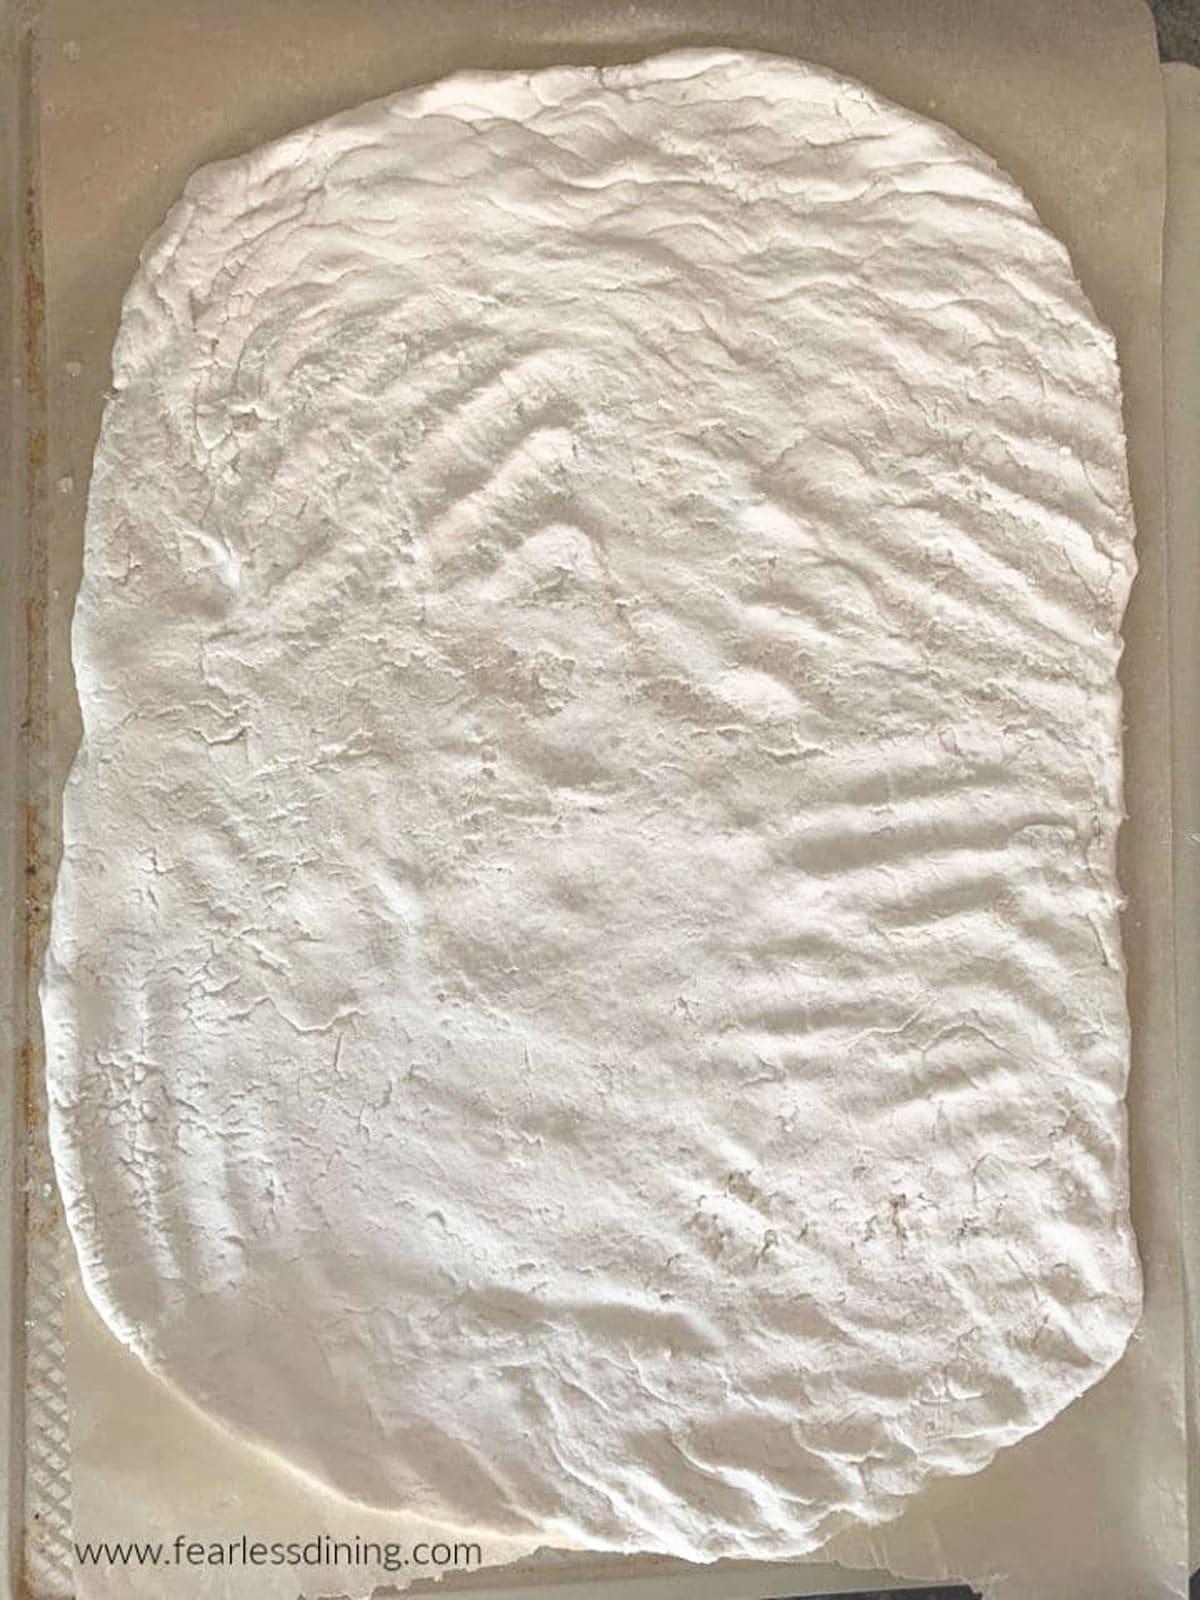 a pizza crust on a baking sheet